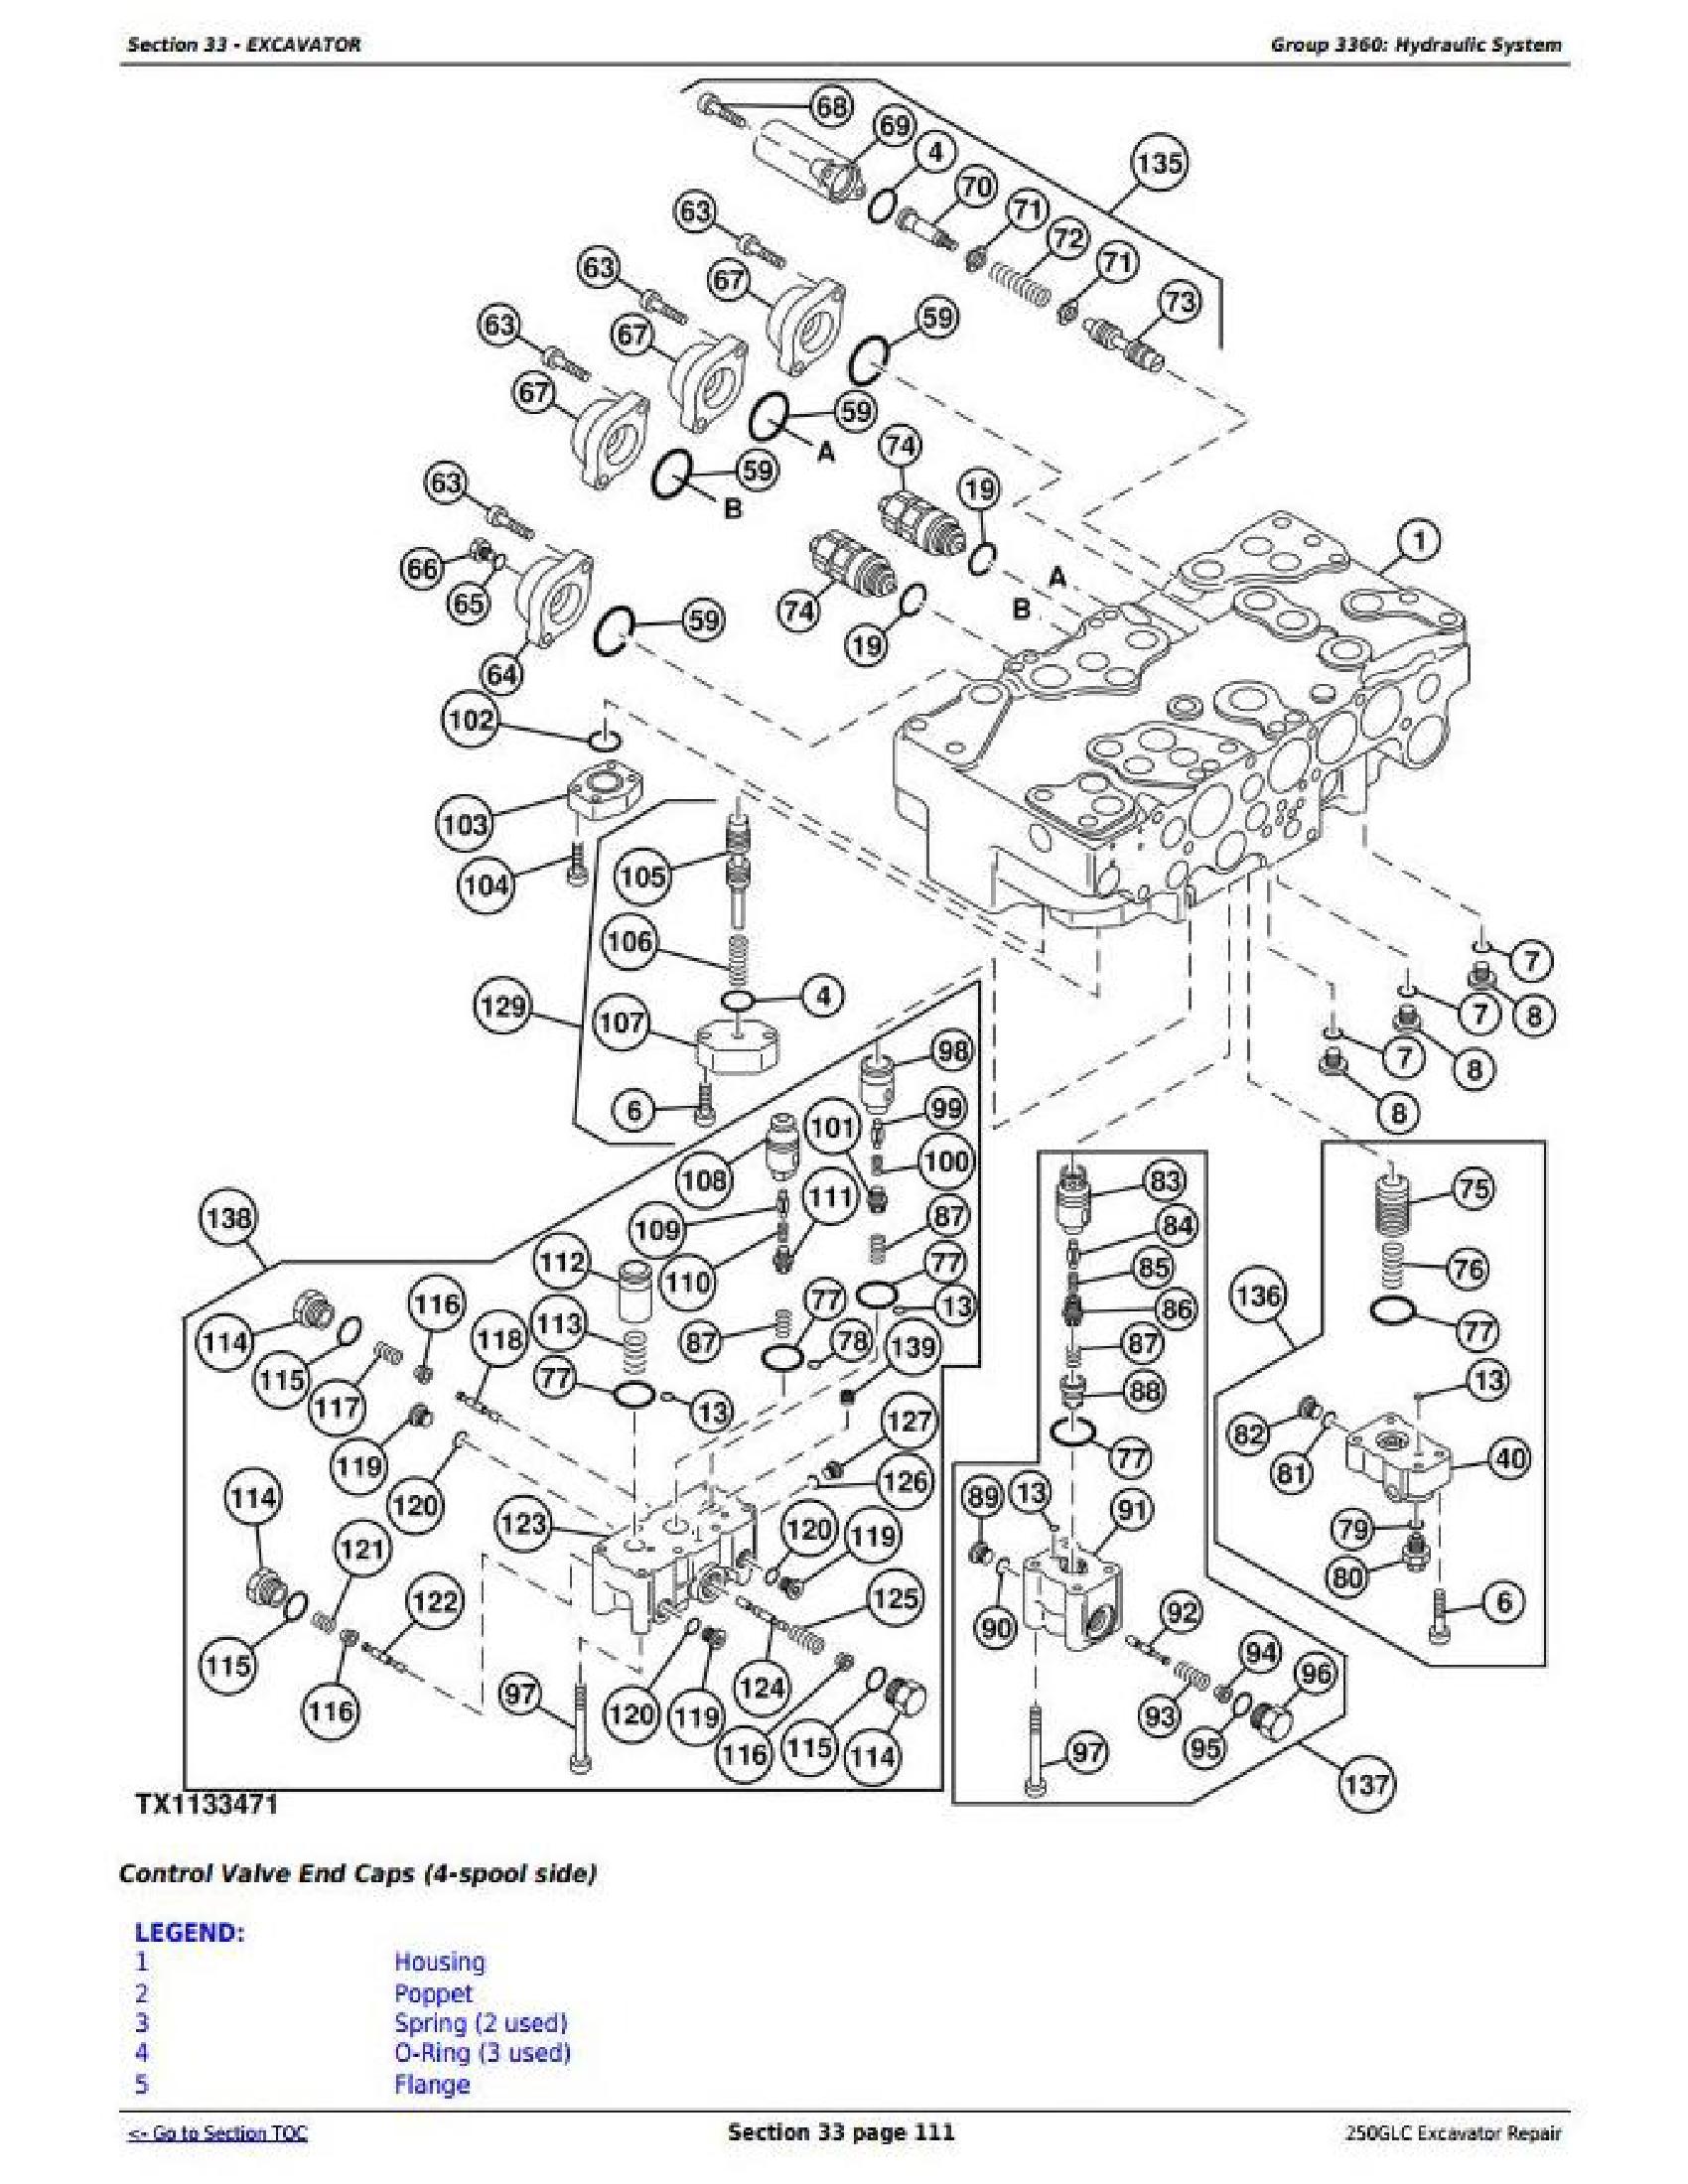 John Deere 1F9250GXC608001- manual pdf